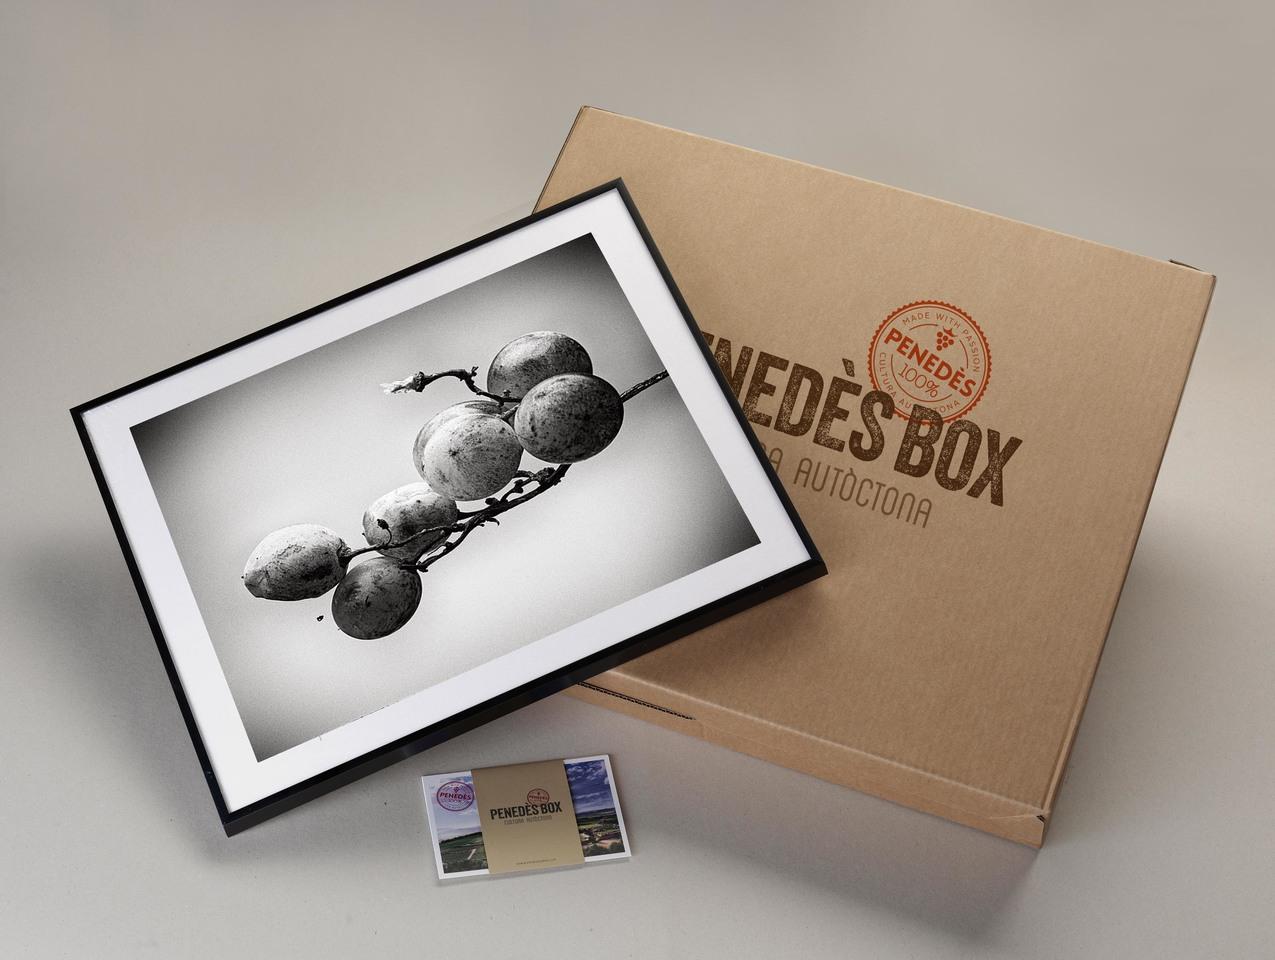 Large box 13 1